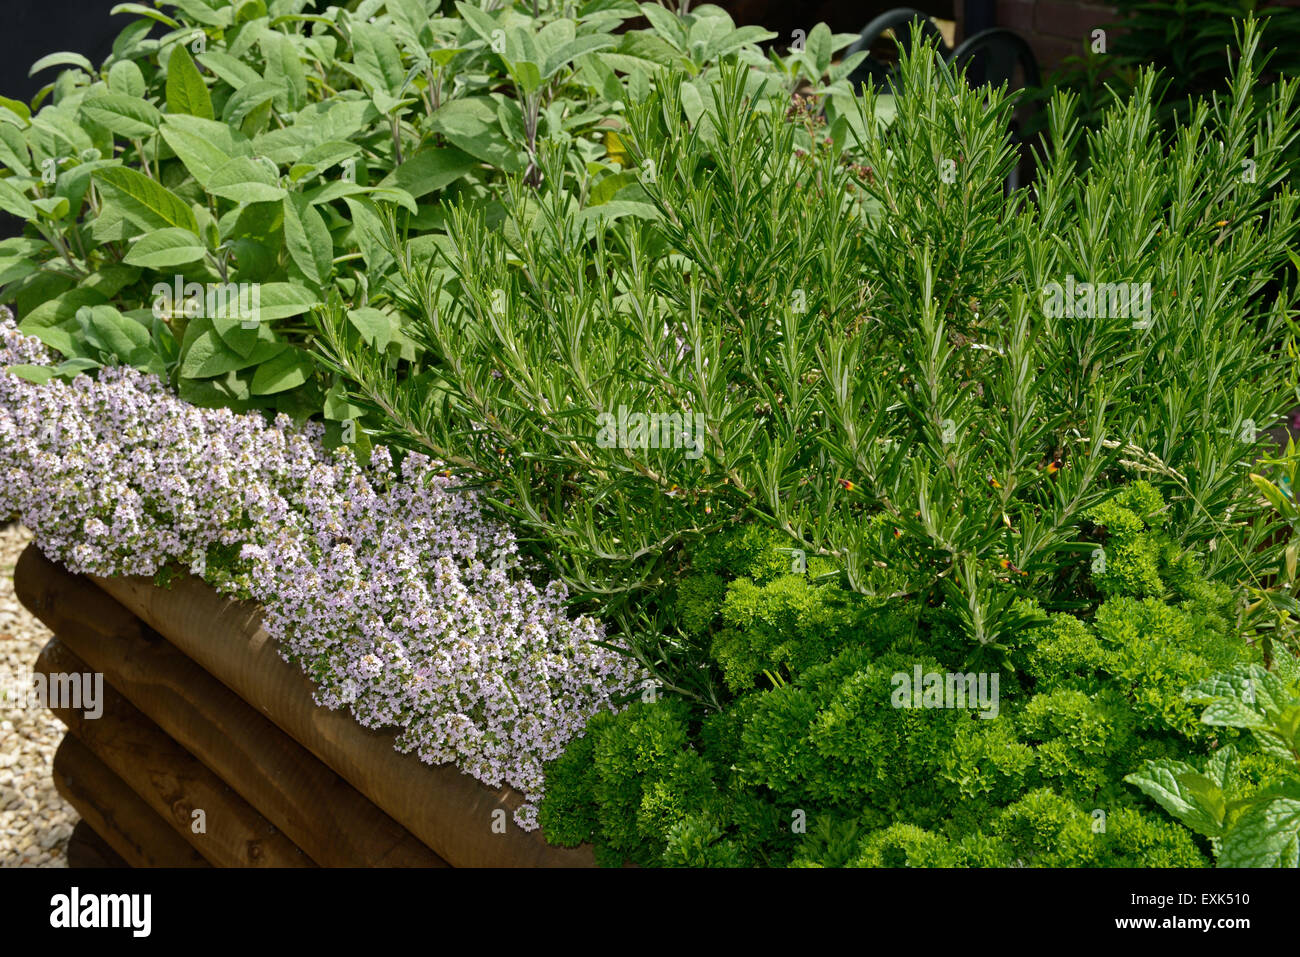 Flowering Rosemary Plant Stock Photos & Flowering Rosemary